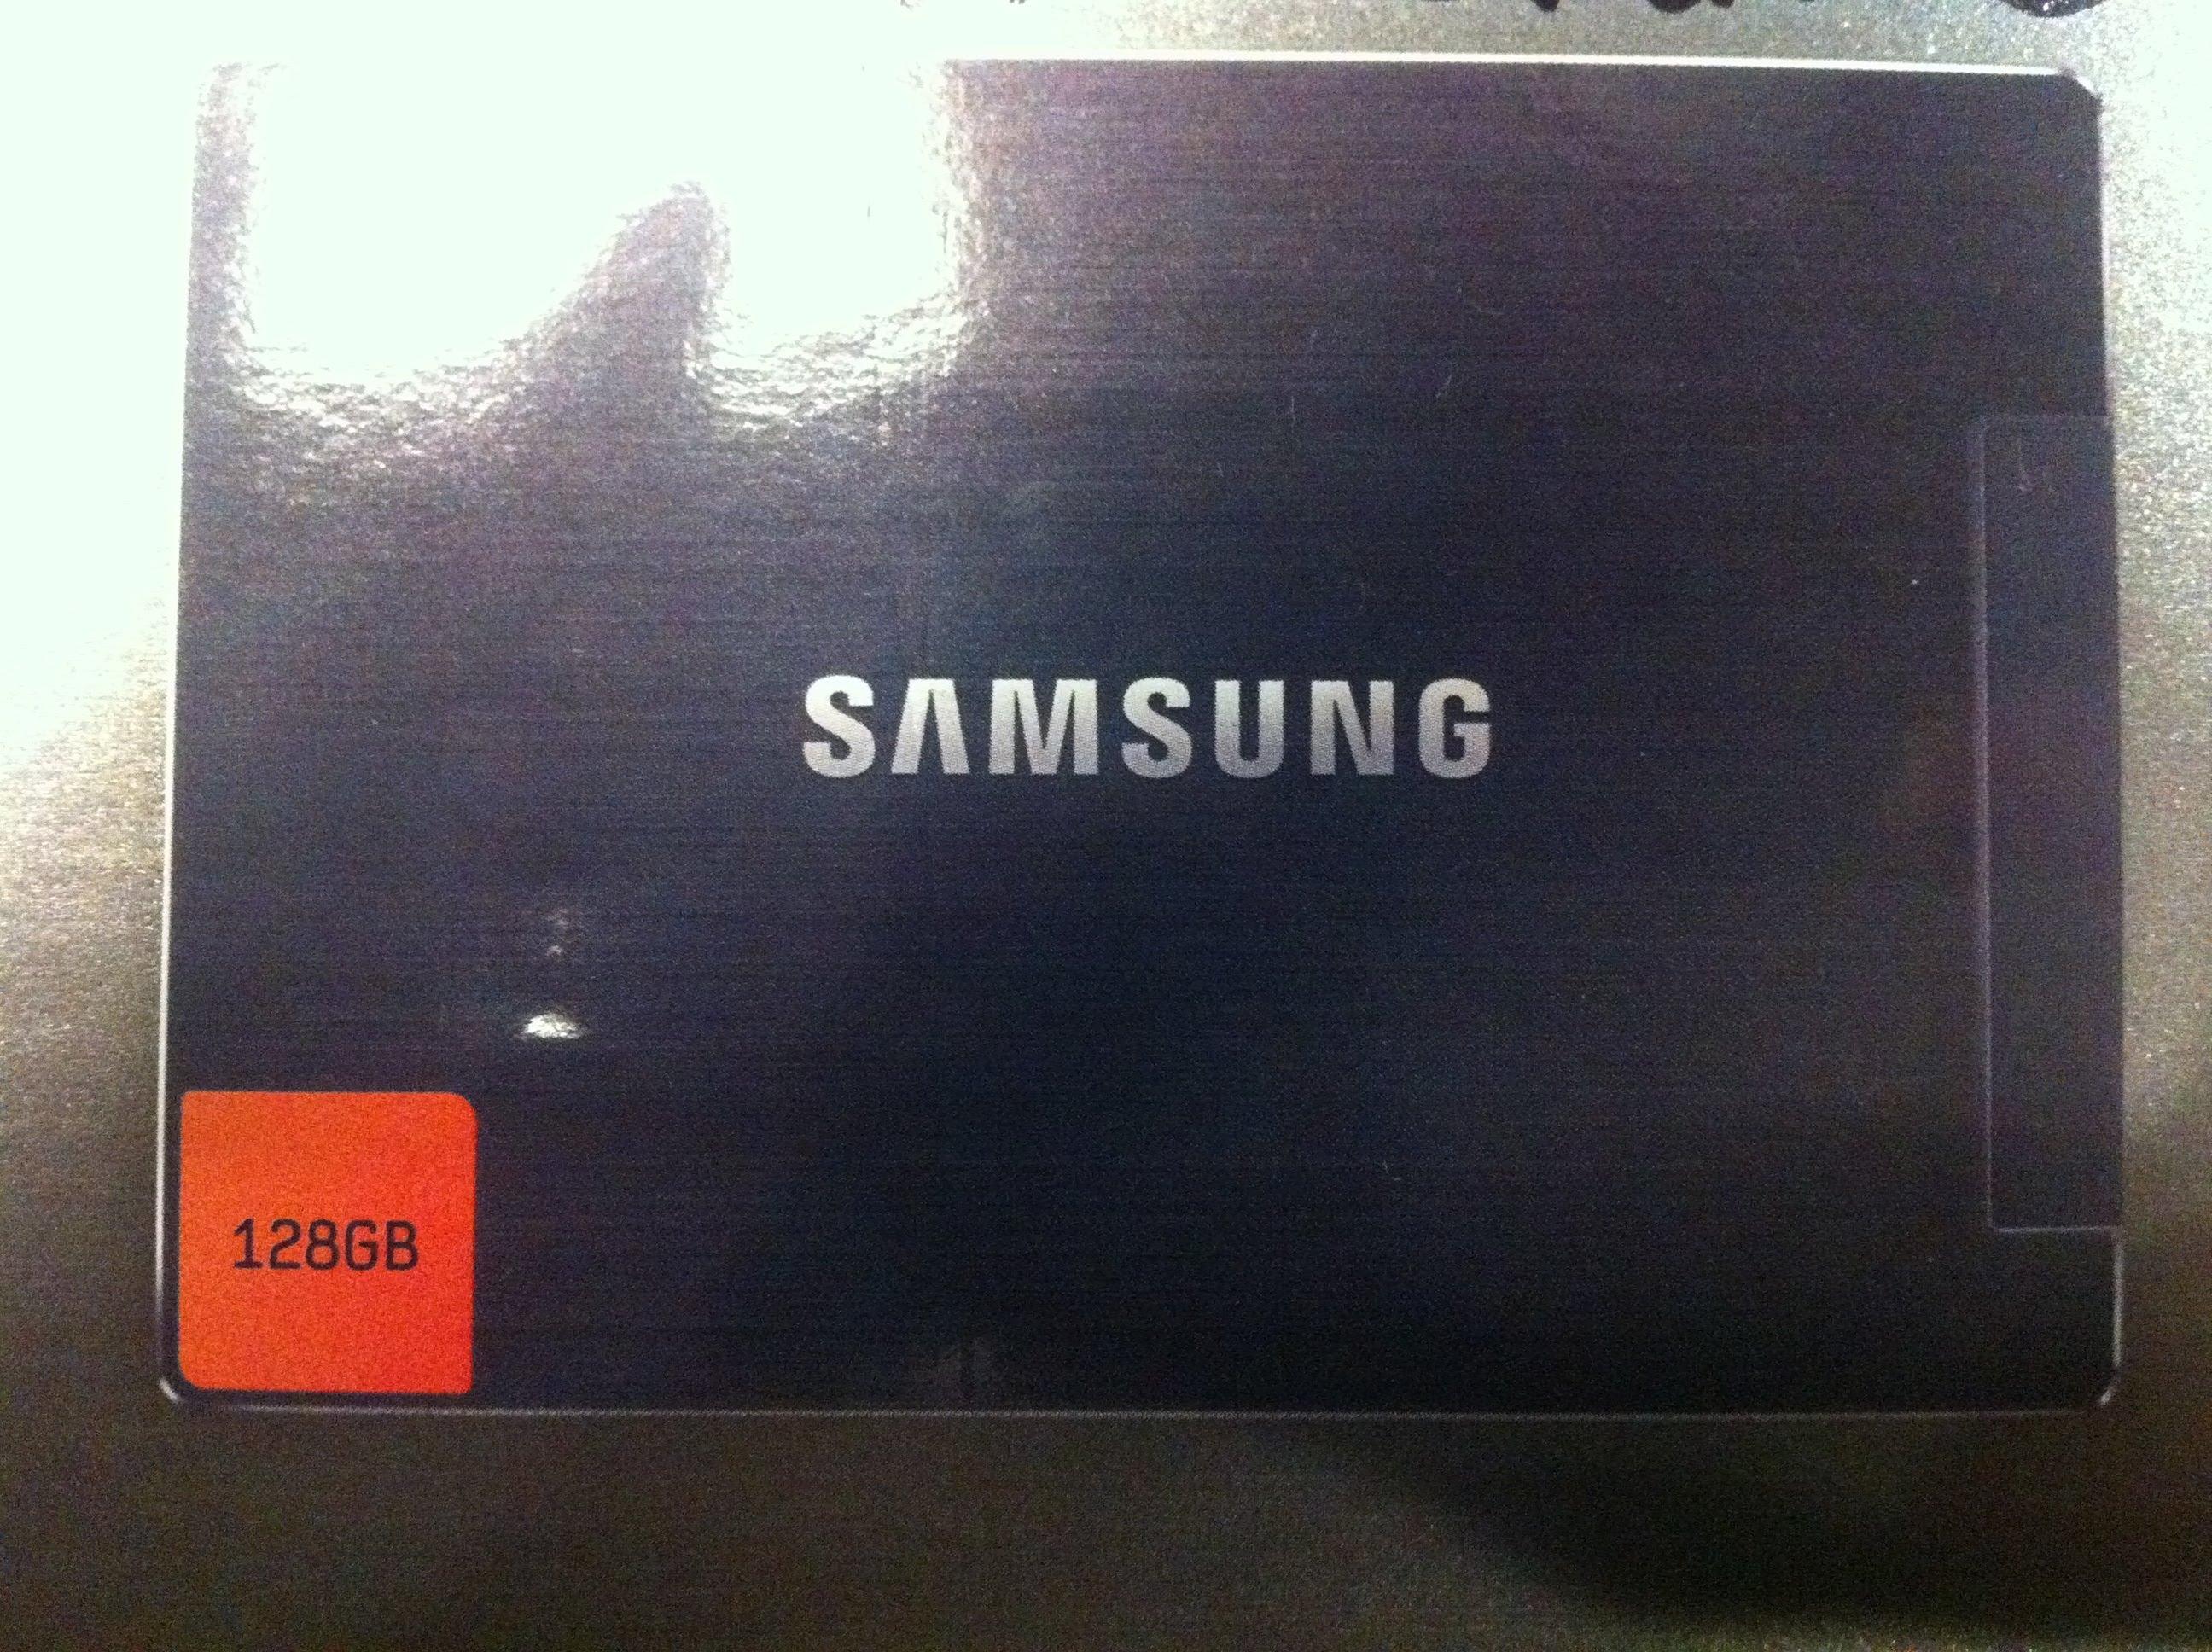 Samsung 830 Series, 128GB AS SSD Benchmark, SATA II